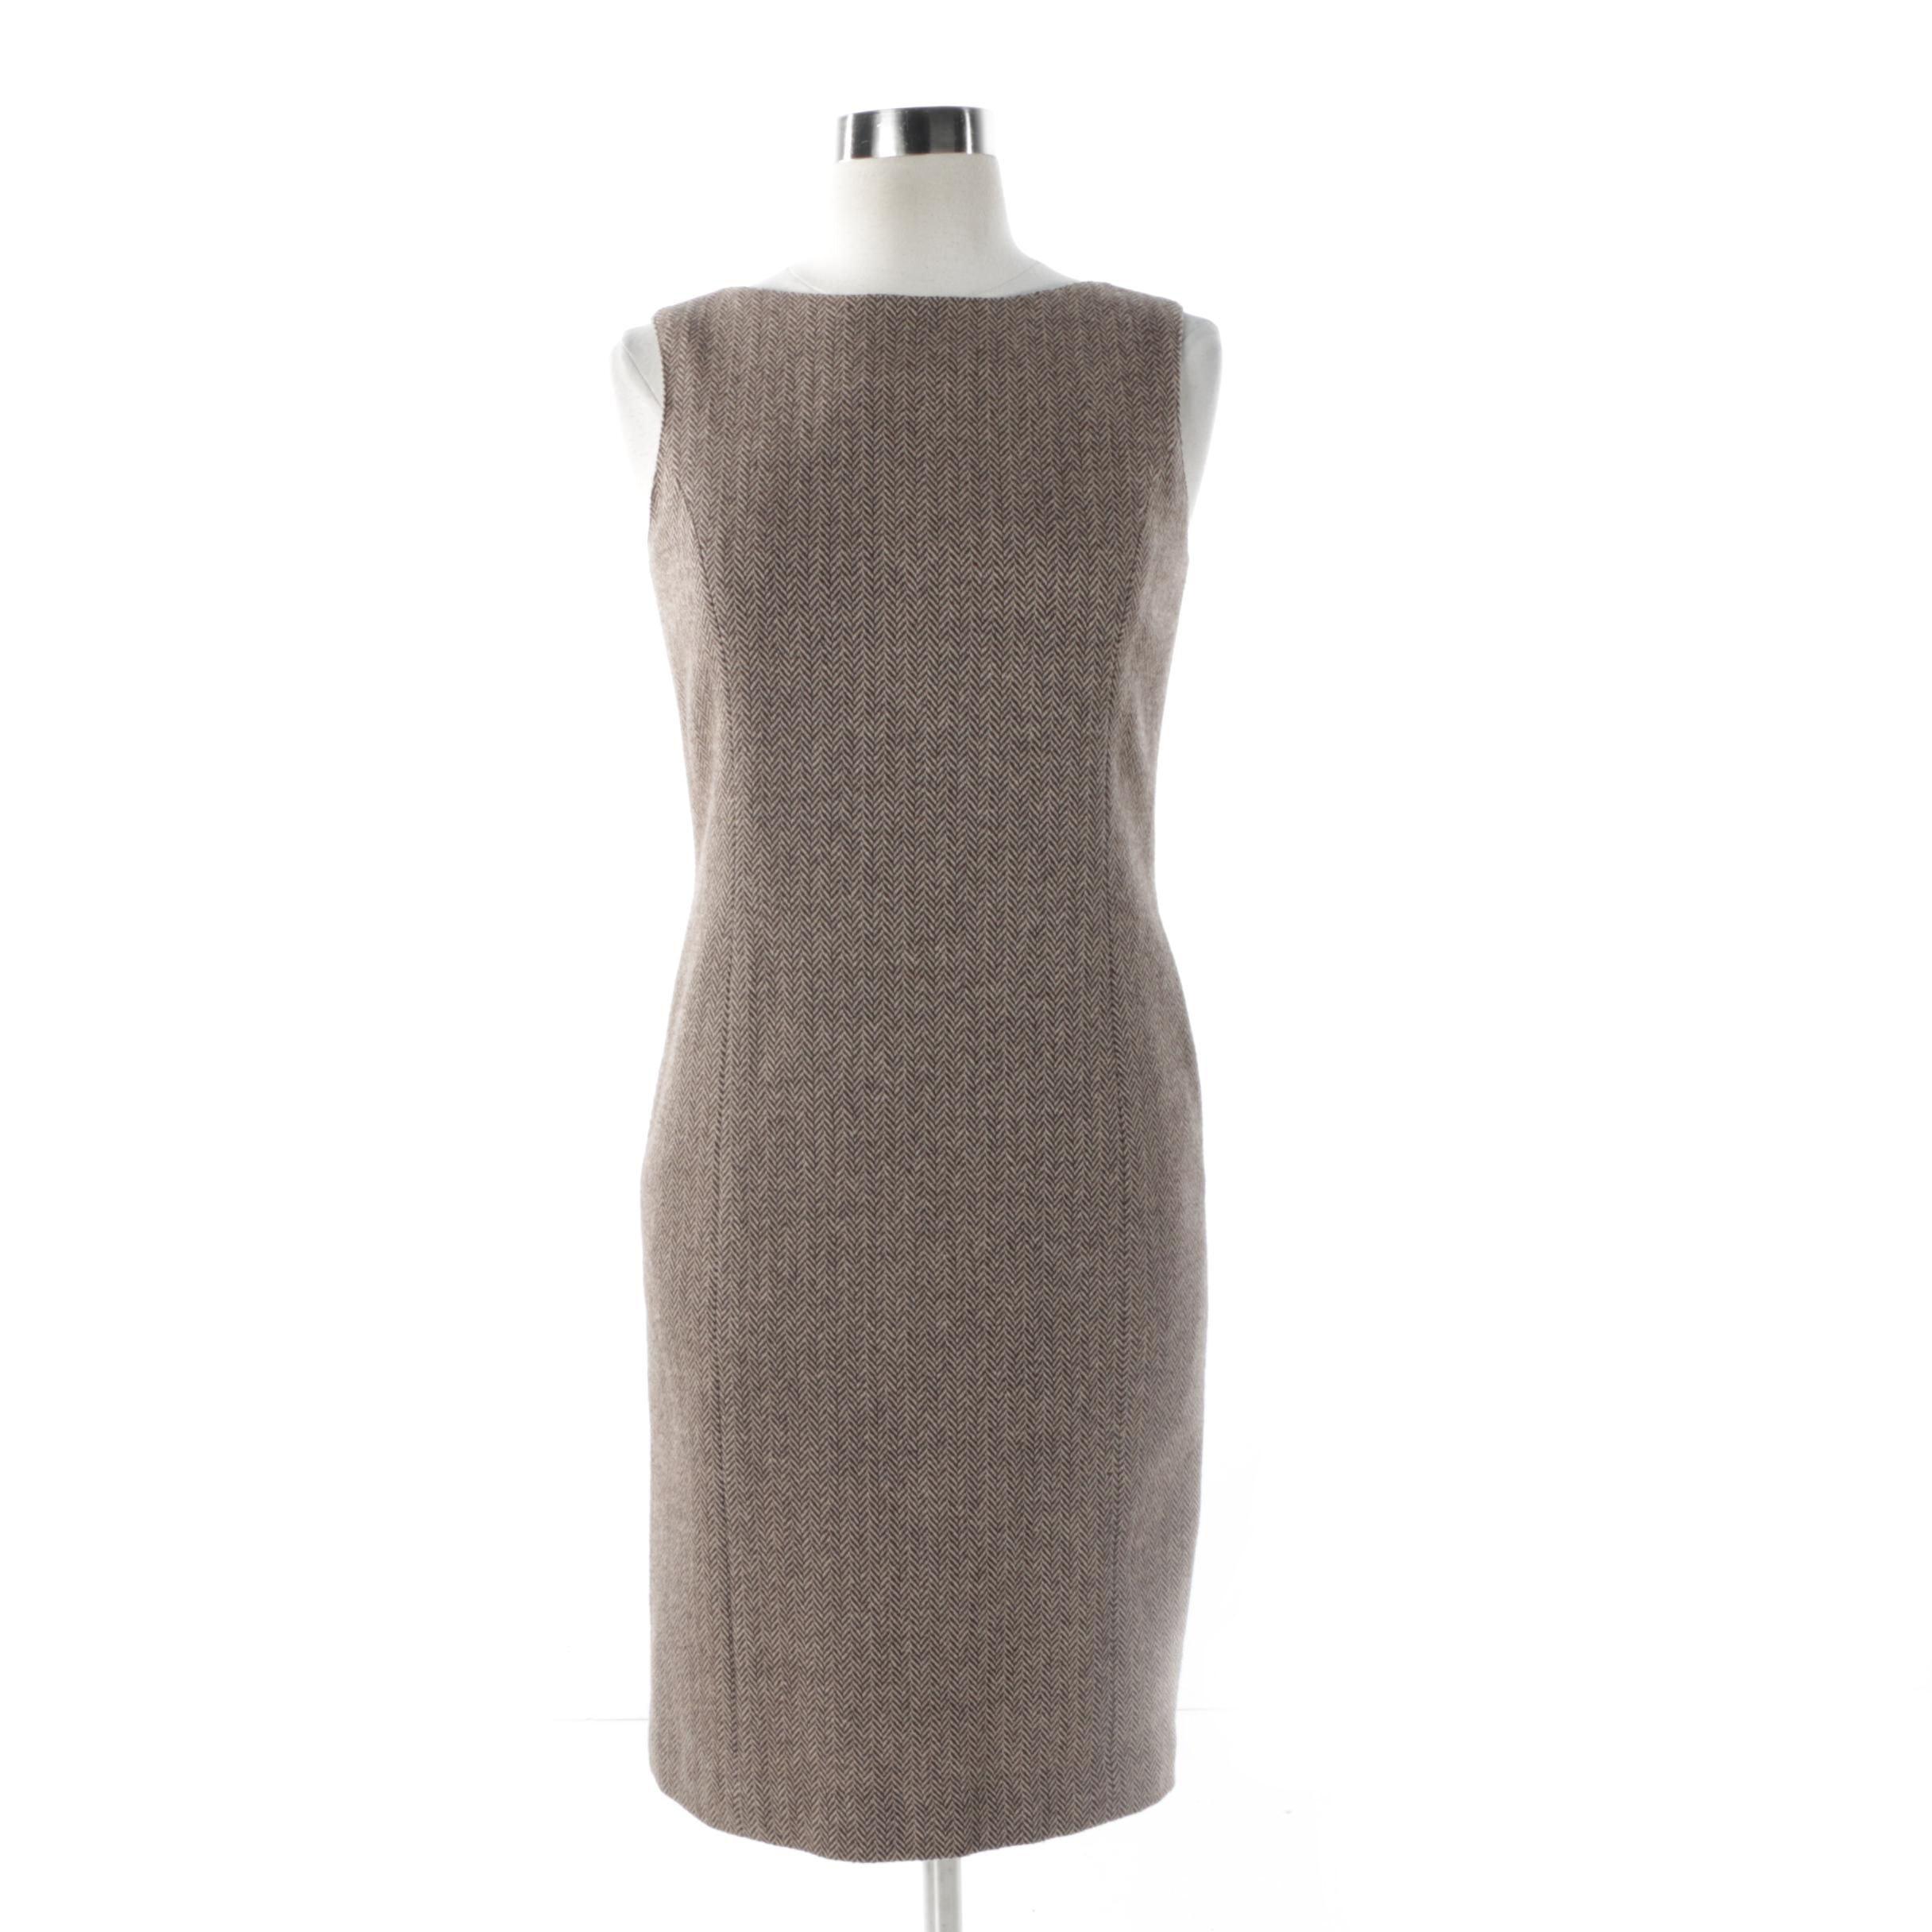 Kate Spade Herringbone Wool Blend Dress